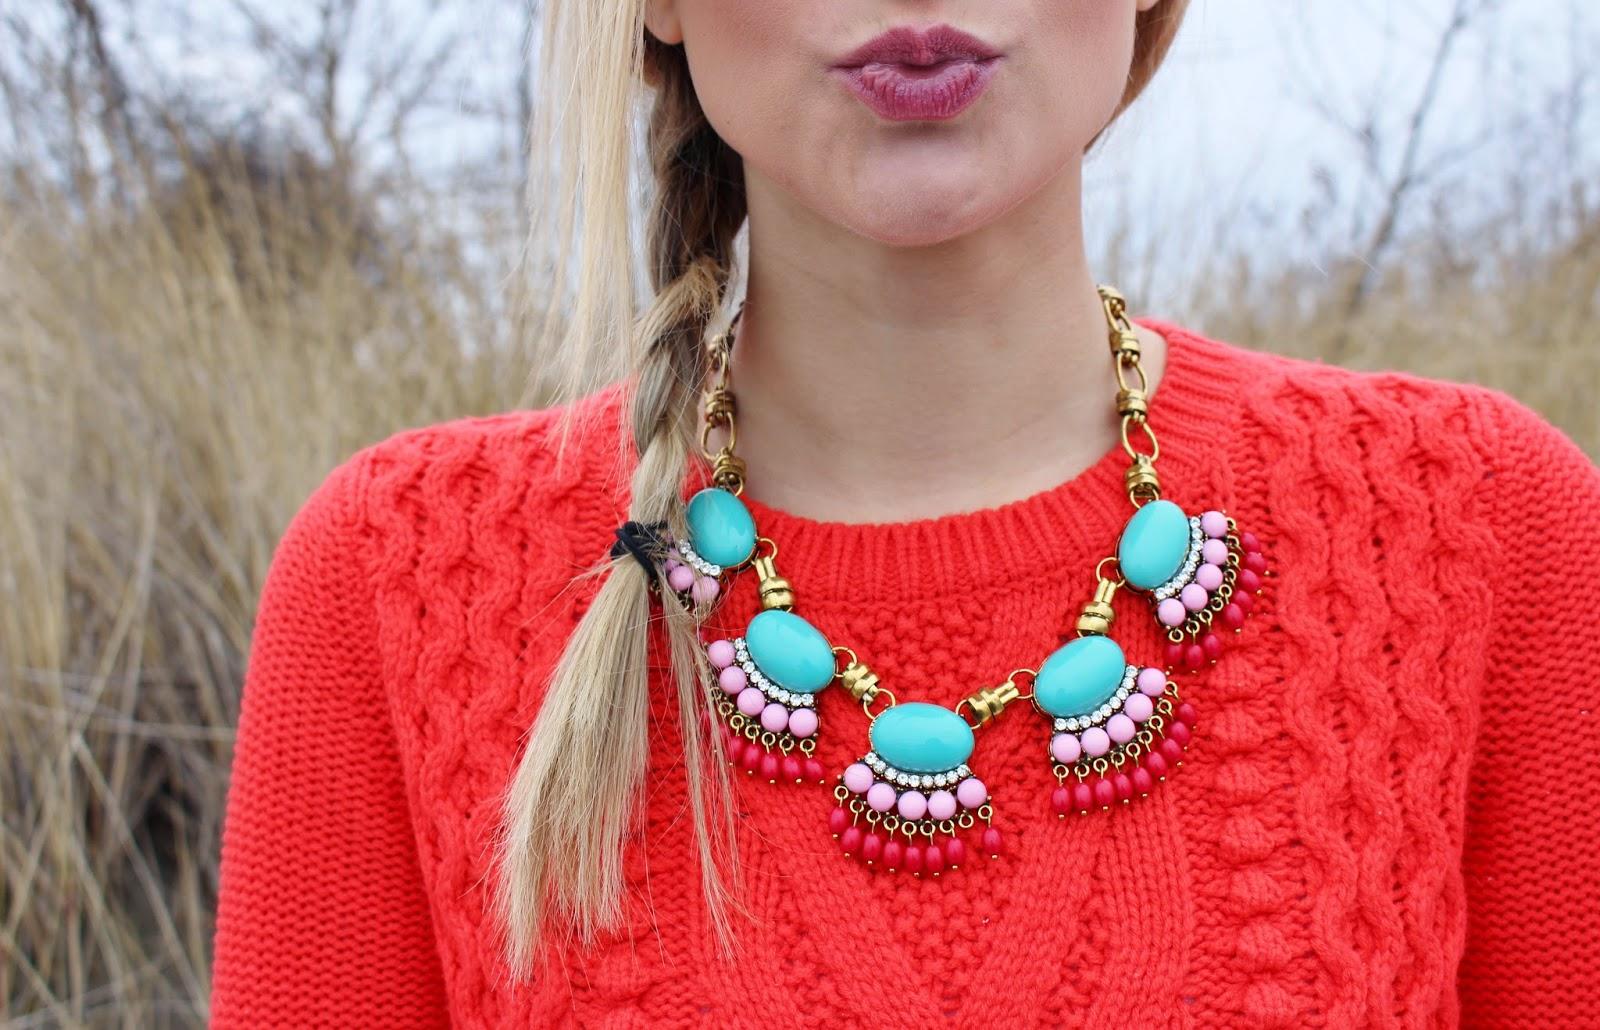 bijuleni - ily Couture necklace